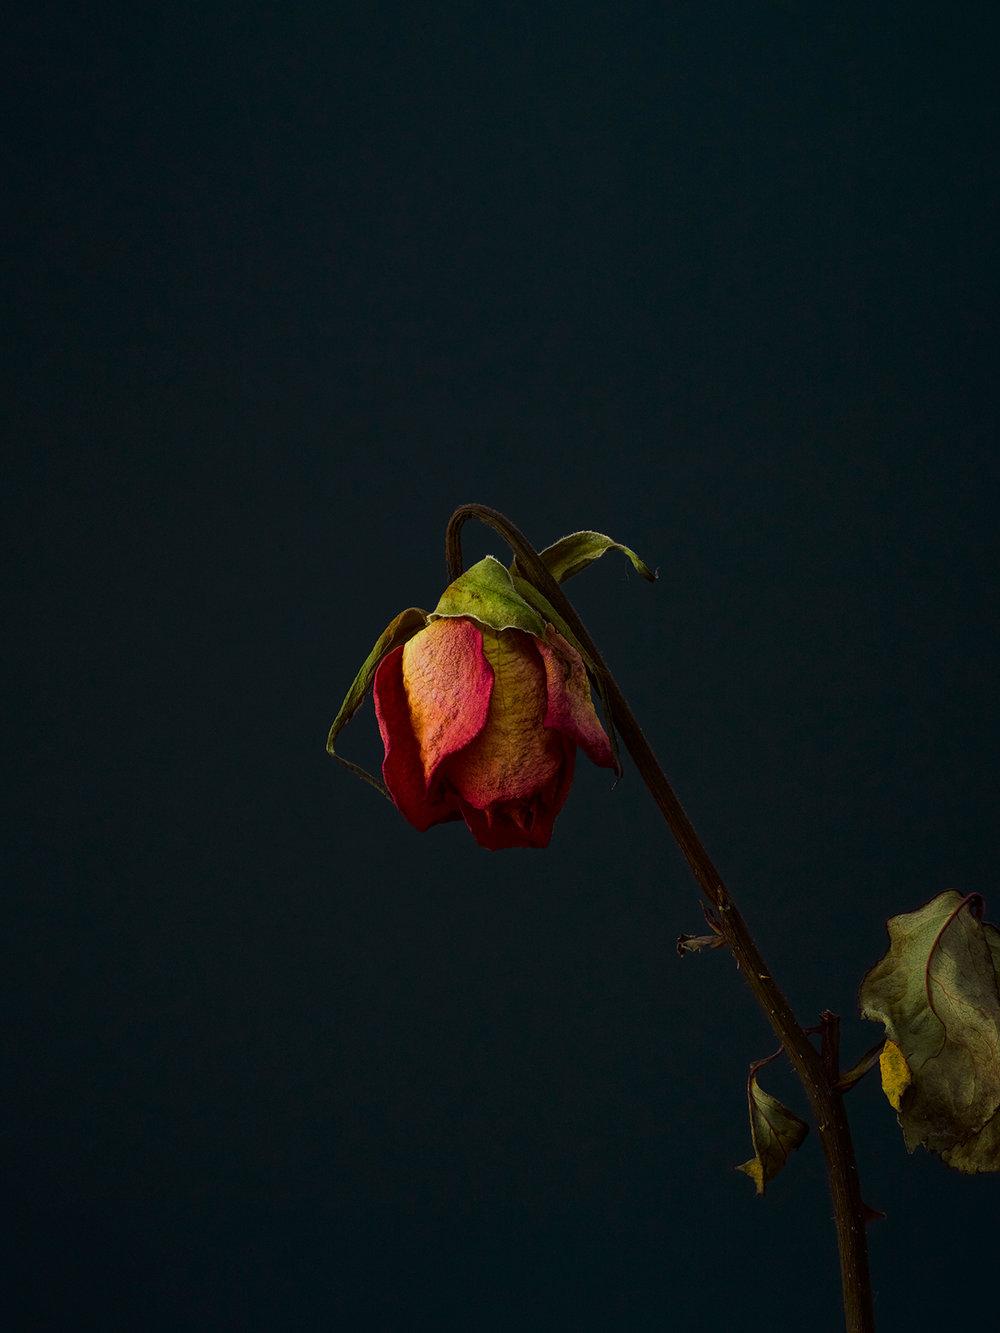 rose-12-copy.jpg